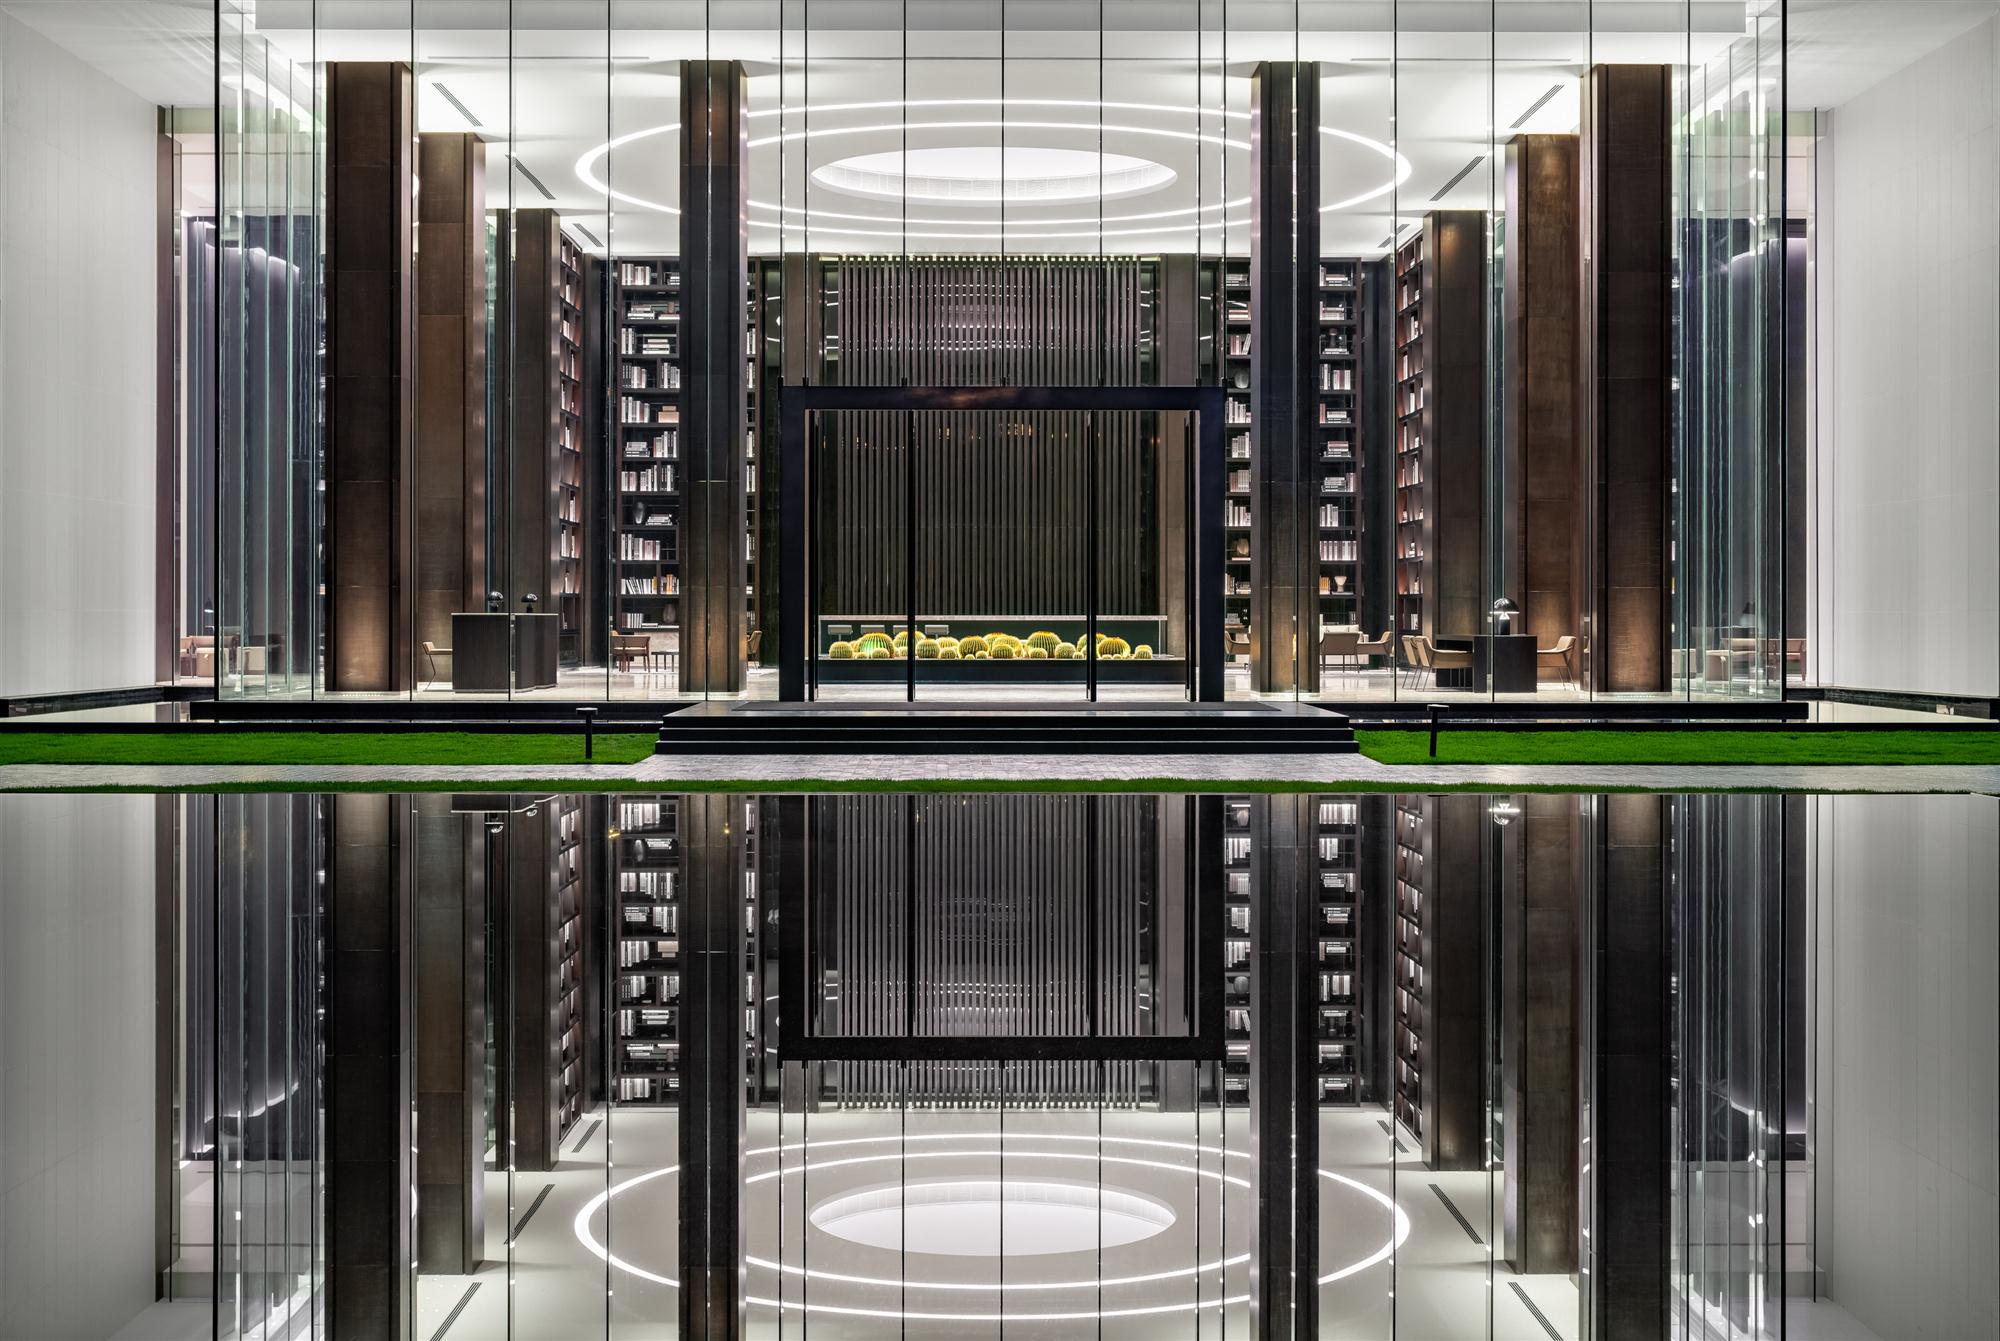 SCDA Architects, Thomas Chan Designs Limited (TCDL)